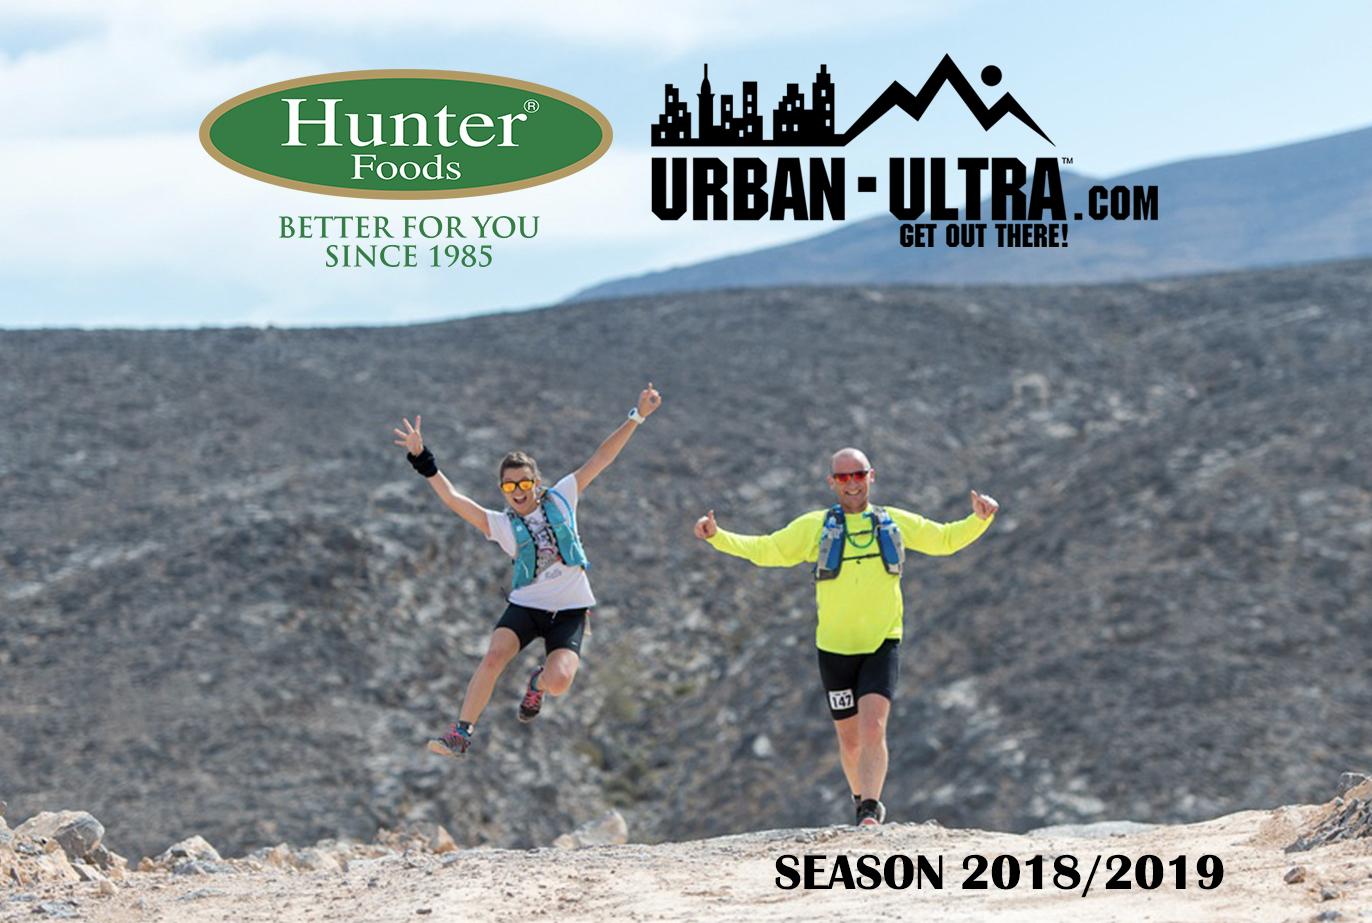 urban-ultra-season-2018-2019-hunter-foods